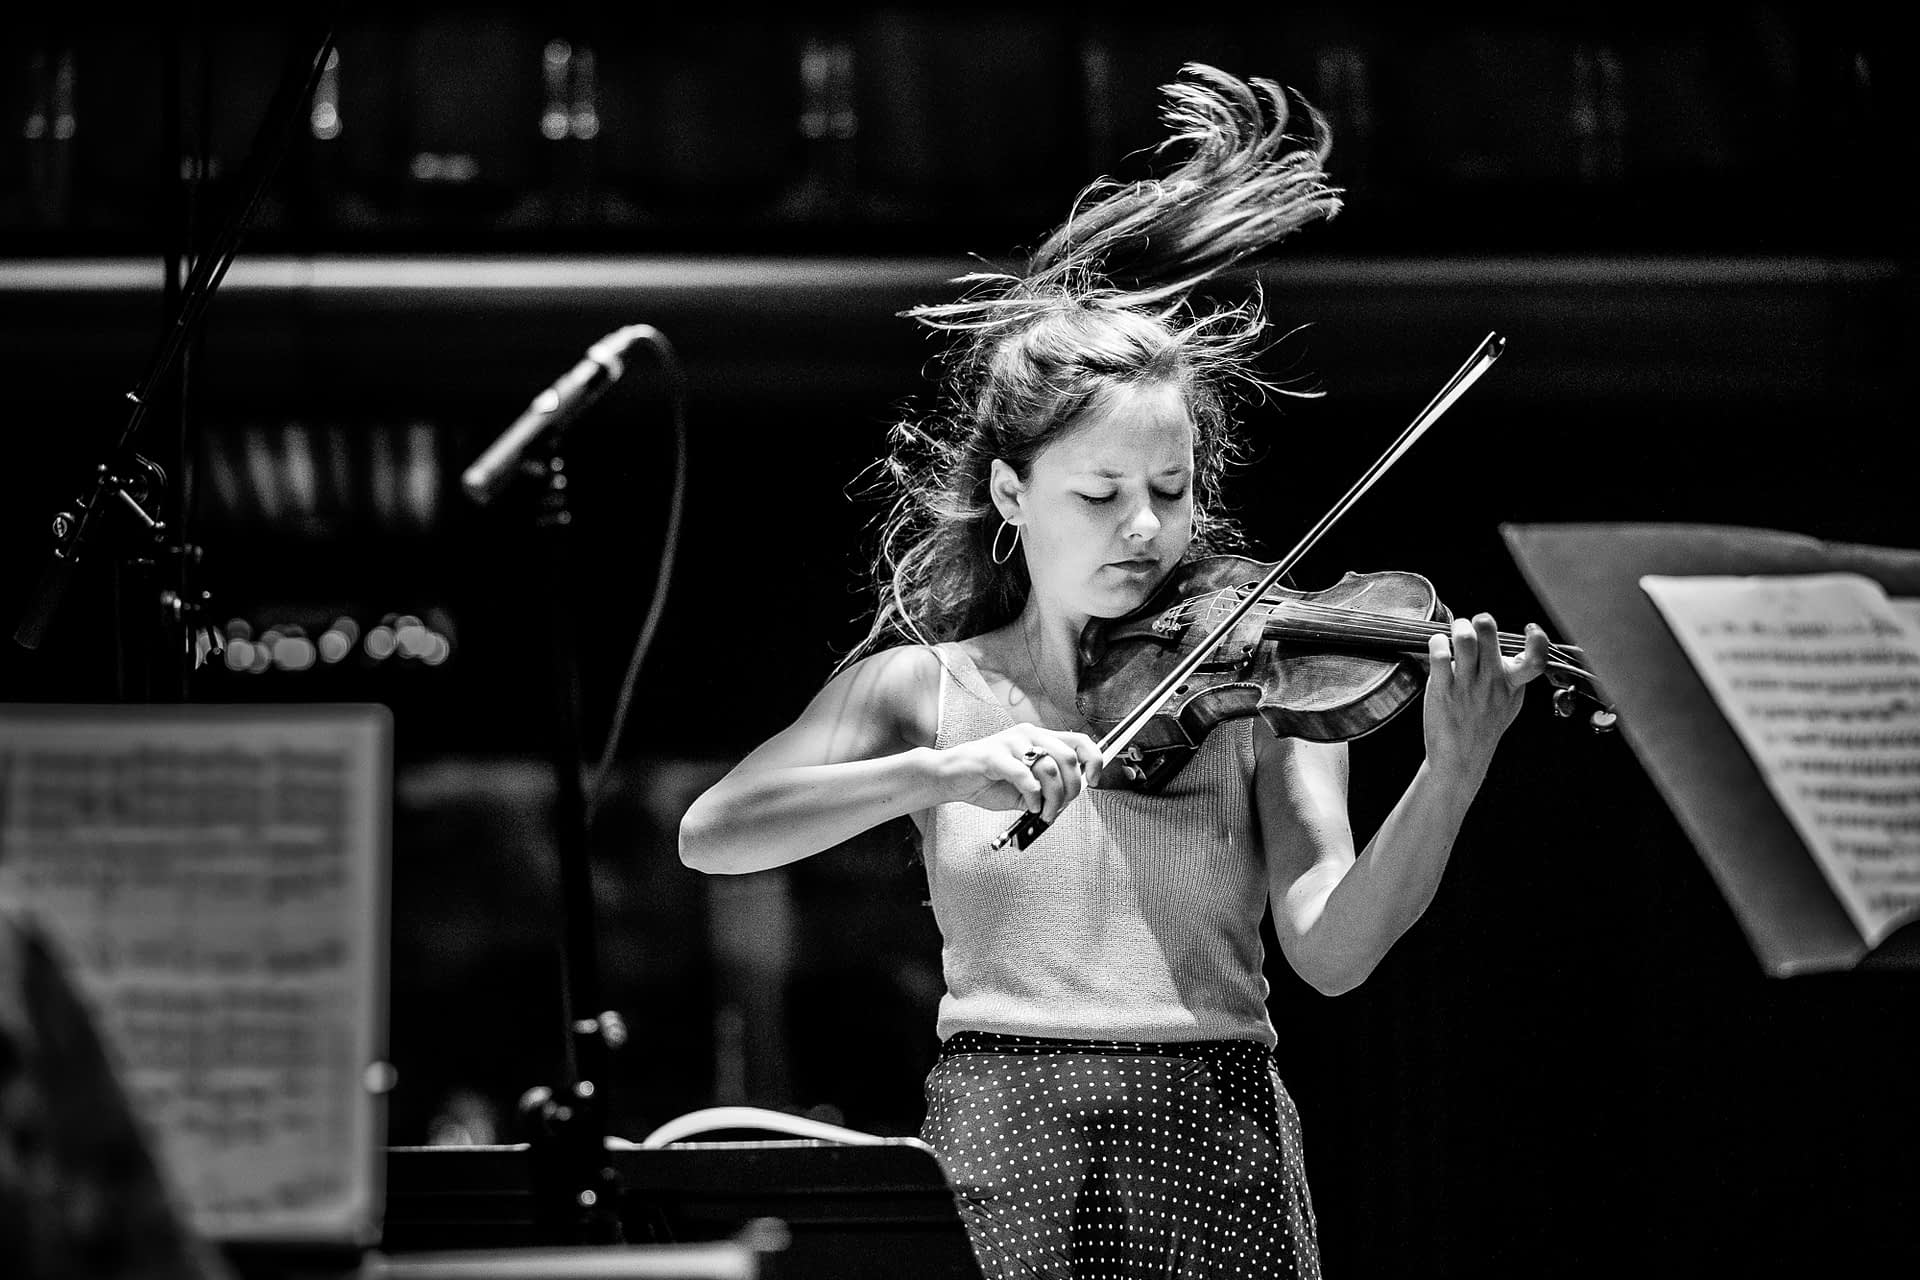 L'OCG avec Alexandra Conunova by STEMUTZ, Studio Ansermet, 01.07.2020